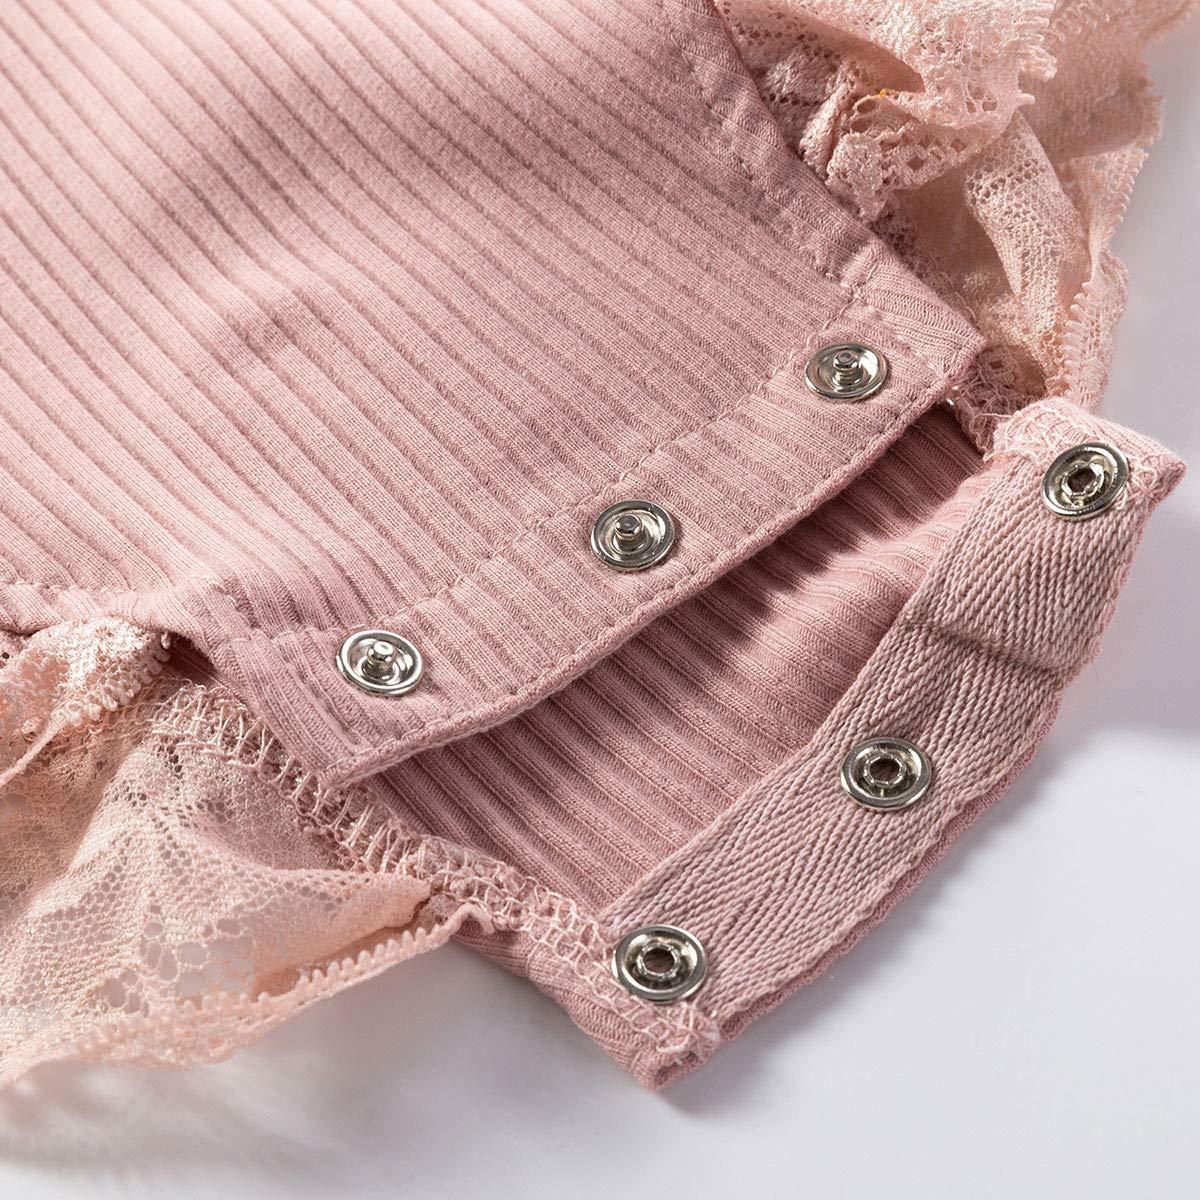 Colorful Childhood Newborn Baby Romper Girls Jumpsuit Infant Bodysuit Tutu Lace Dress Clothes Outfit